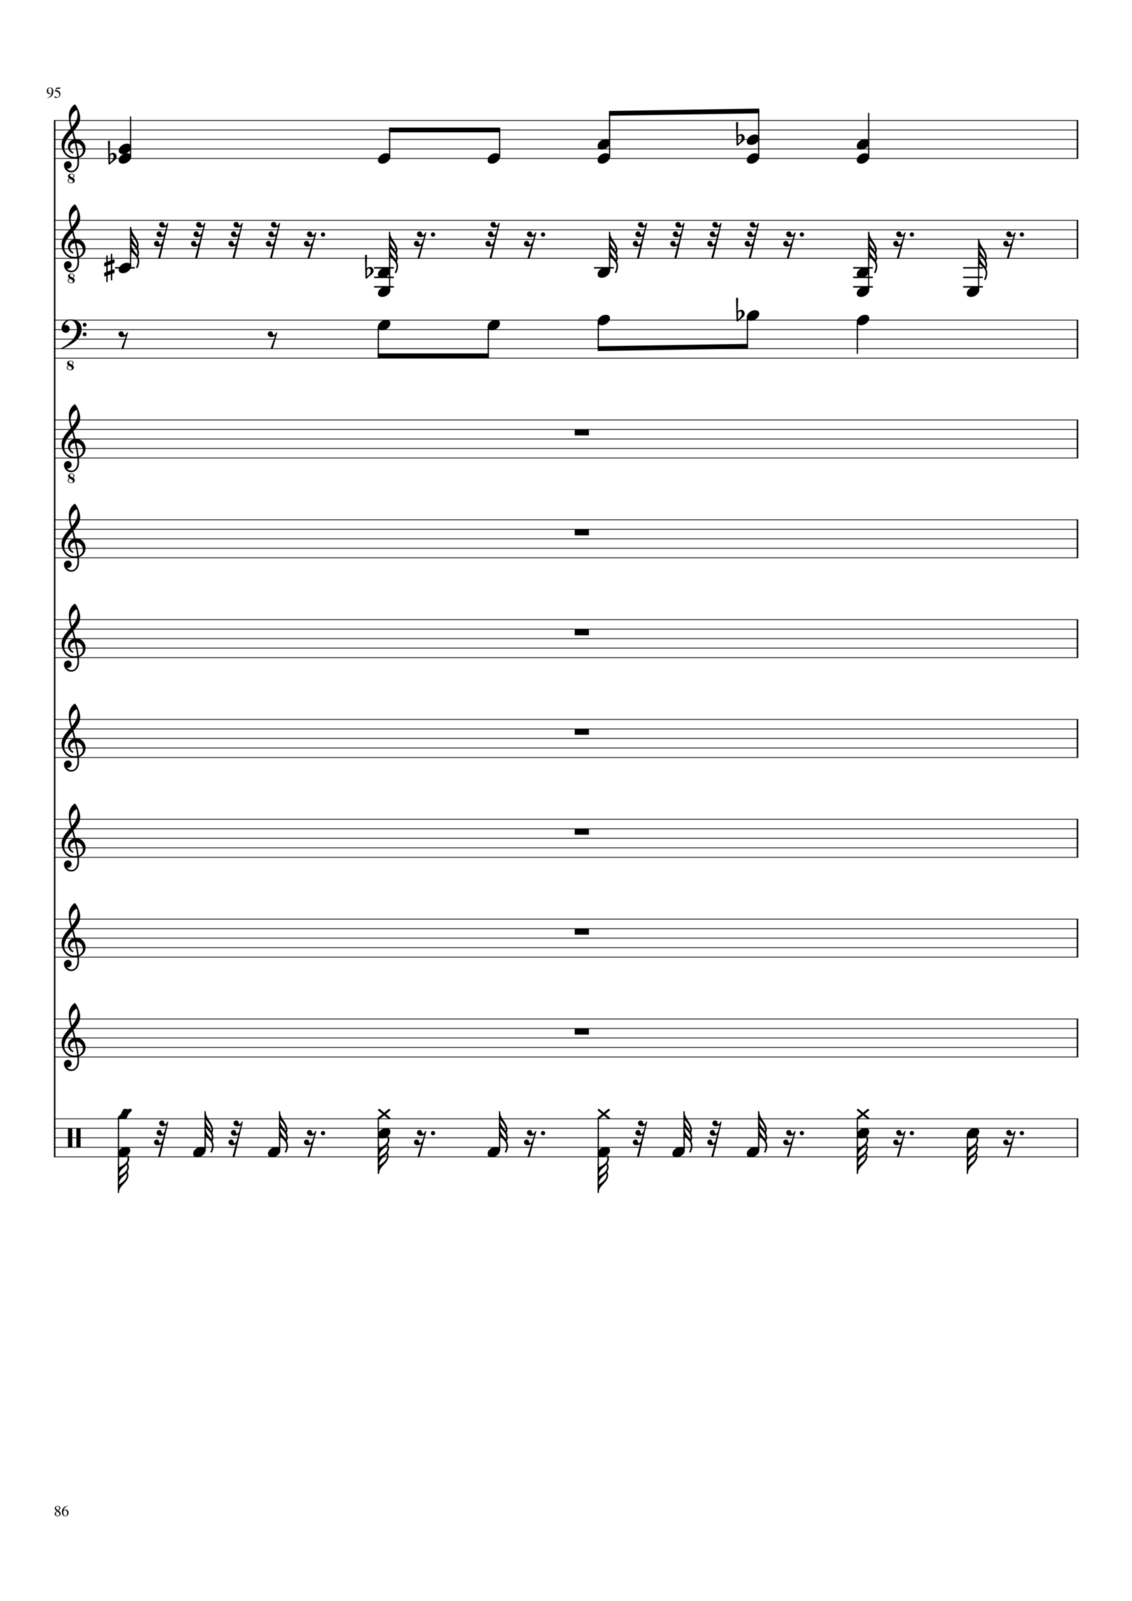 Belyiy sokol slide, Image 86